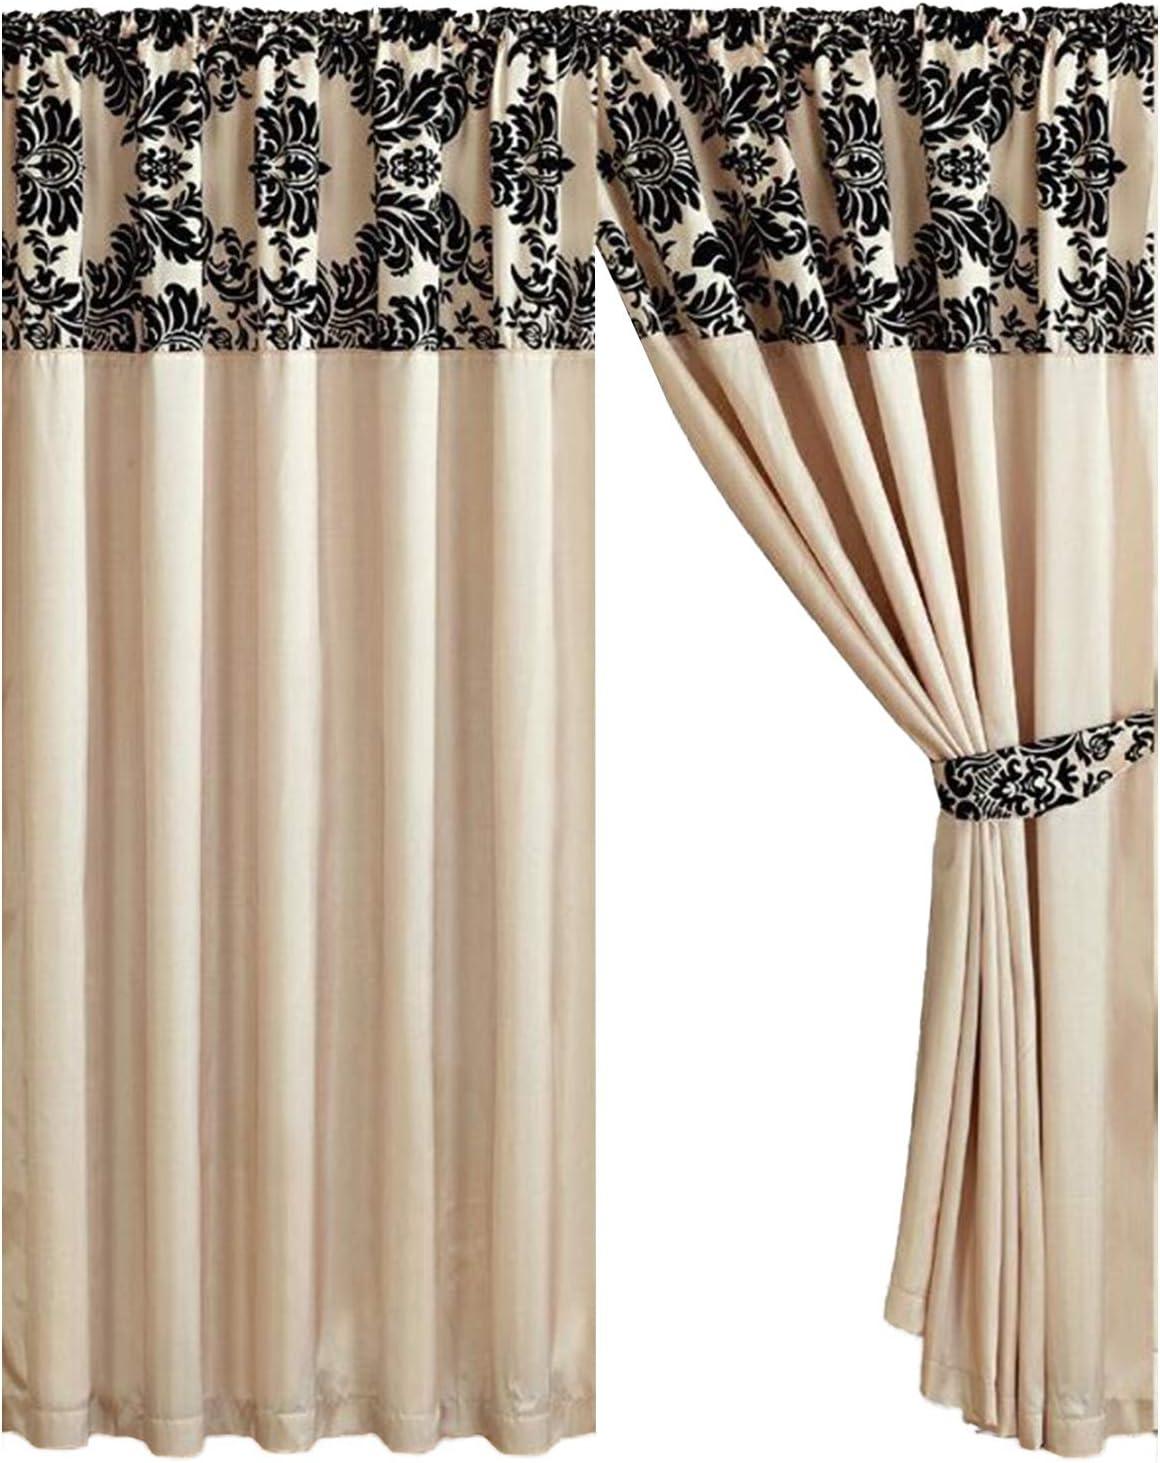 Half Flock Damask Pencil Pleat Curtains (90''x90''(228x228cm), Cream+Black):  Amazon.co.uk: Kitchen & Home